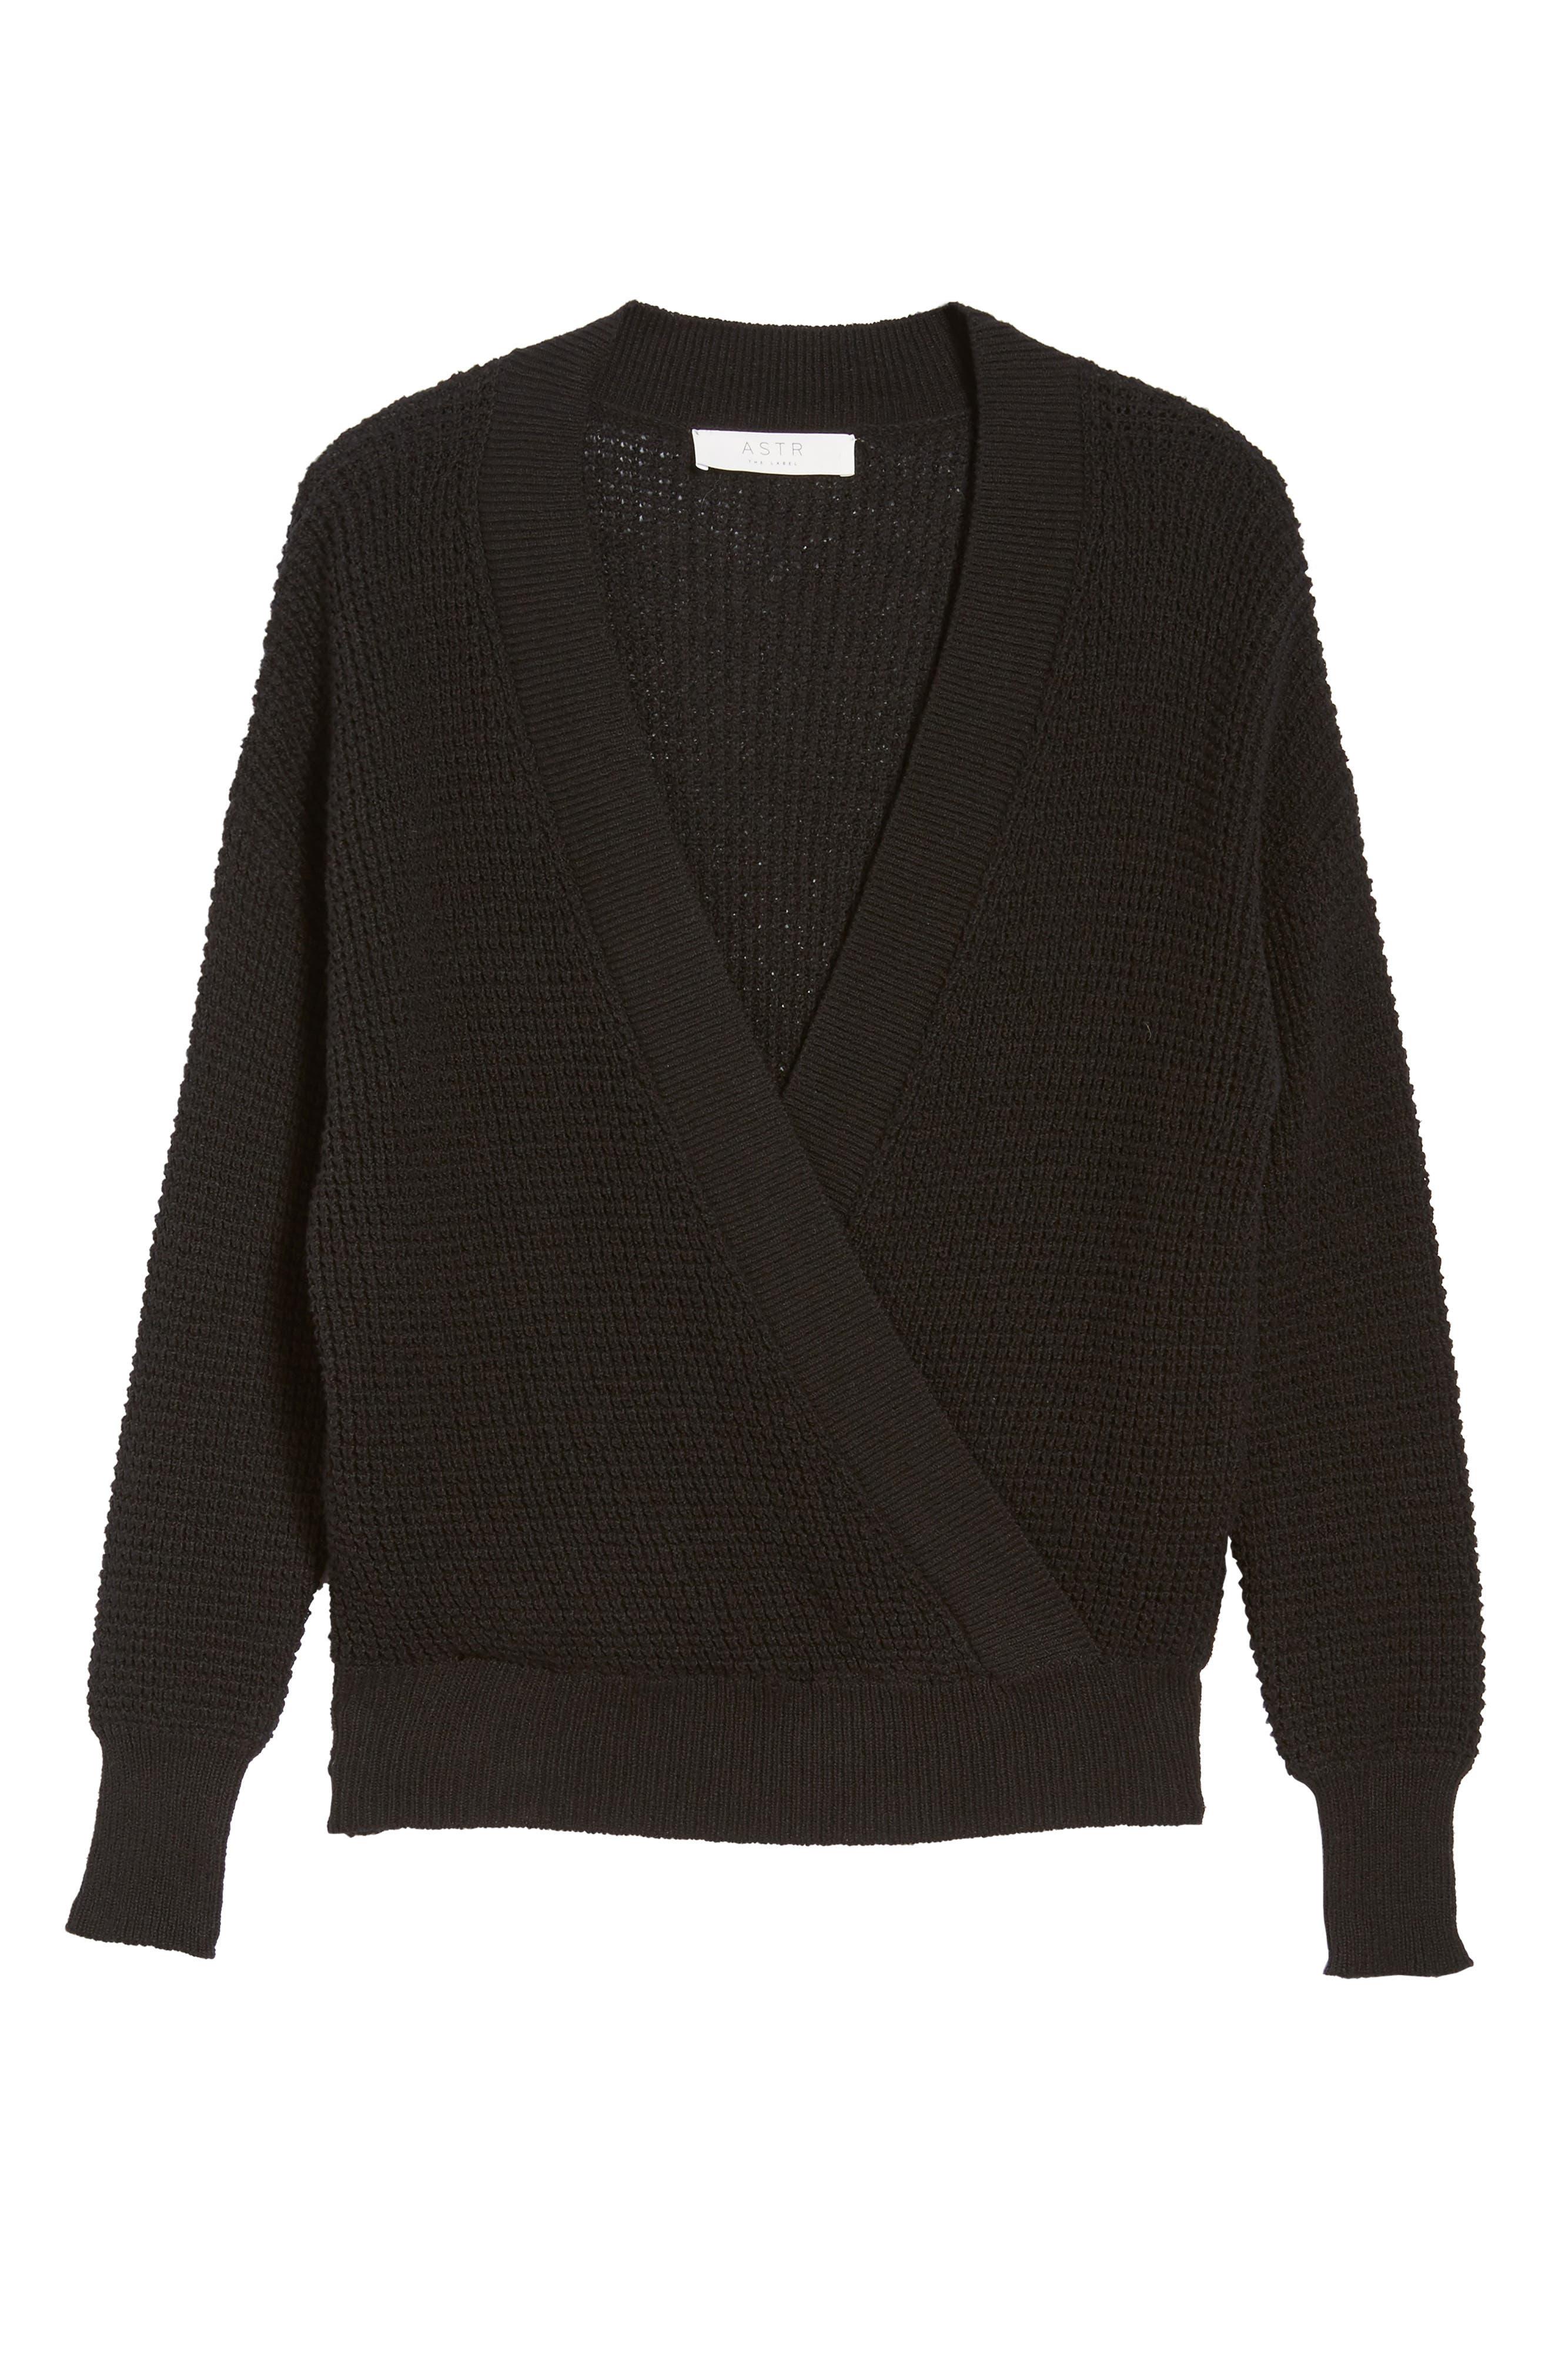 Alternate Image 3  - ASTR the Label Stephanie Surplice Sweater